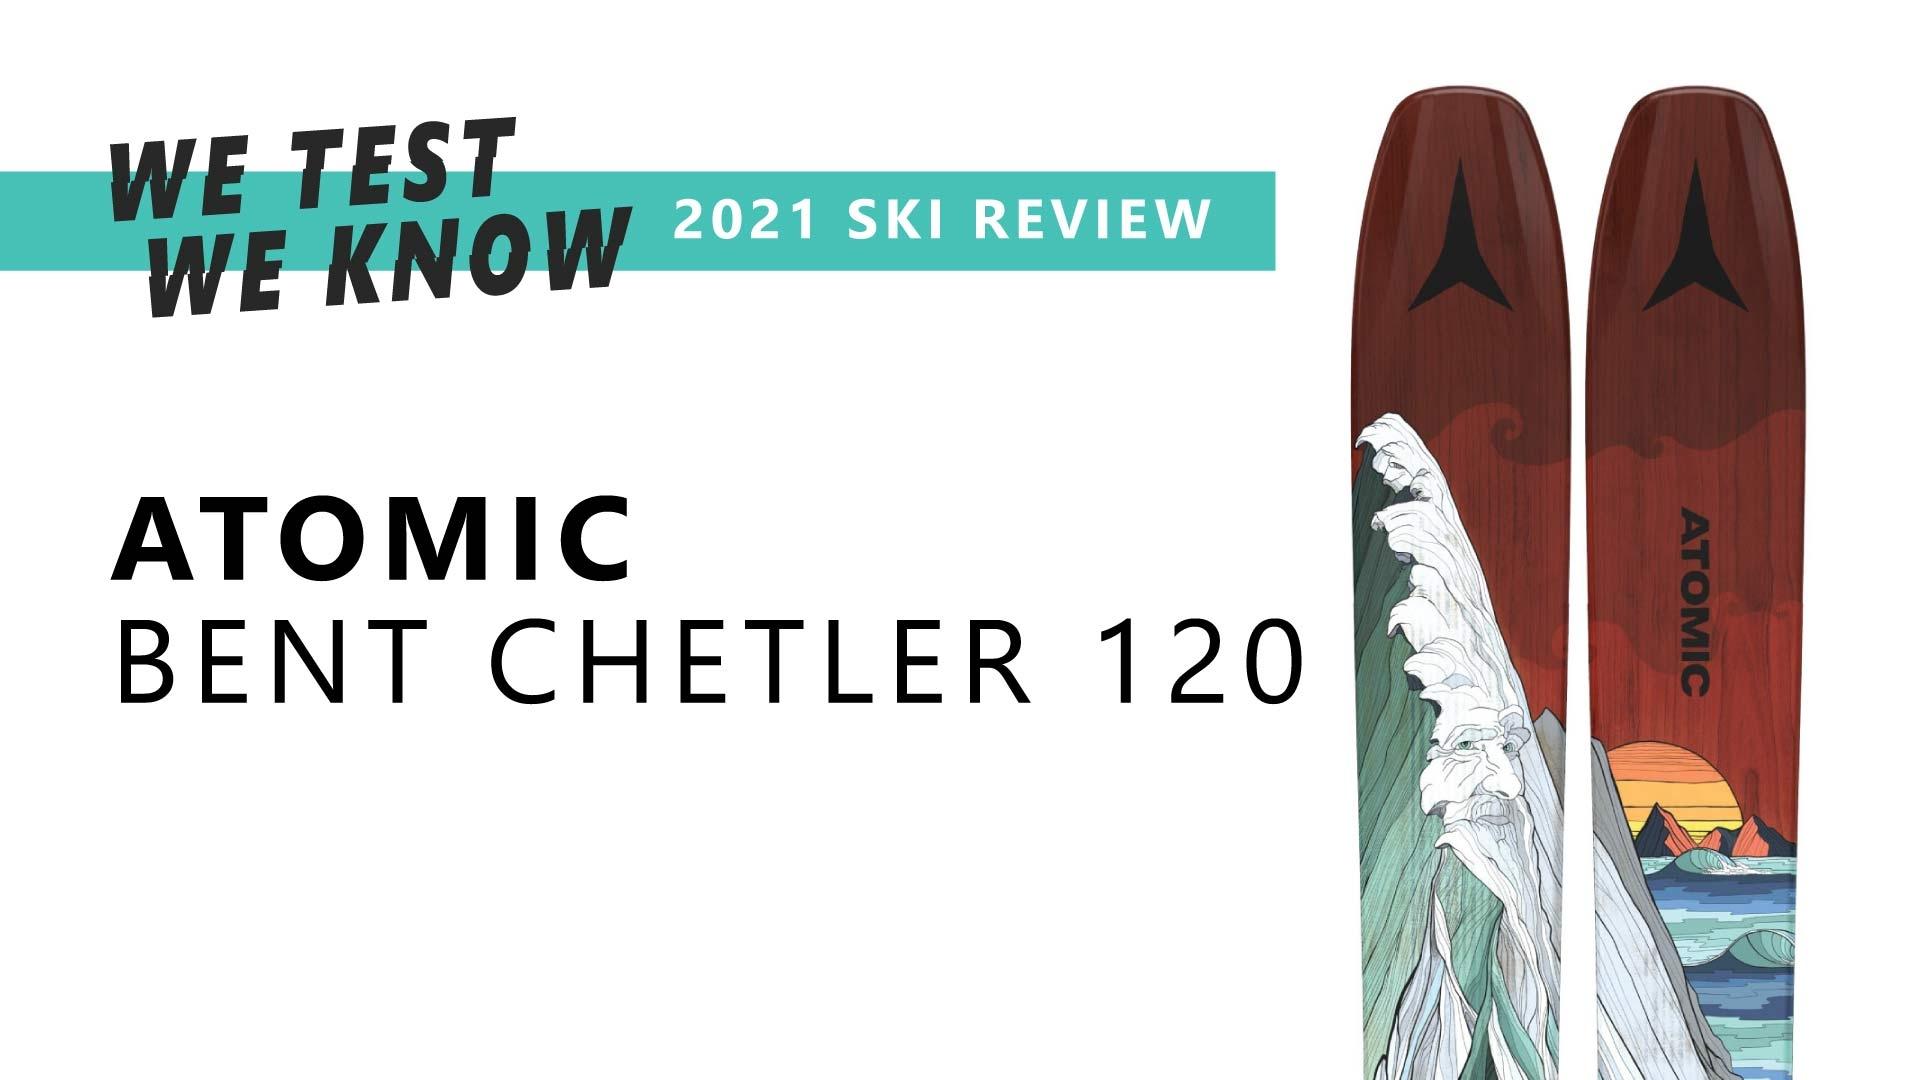 Atomic Bent Chetler 120 | 2021 Ski Review